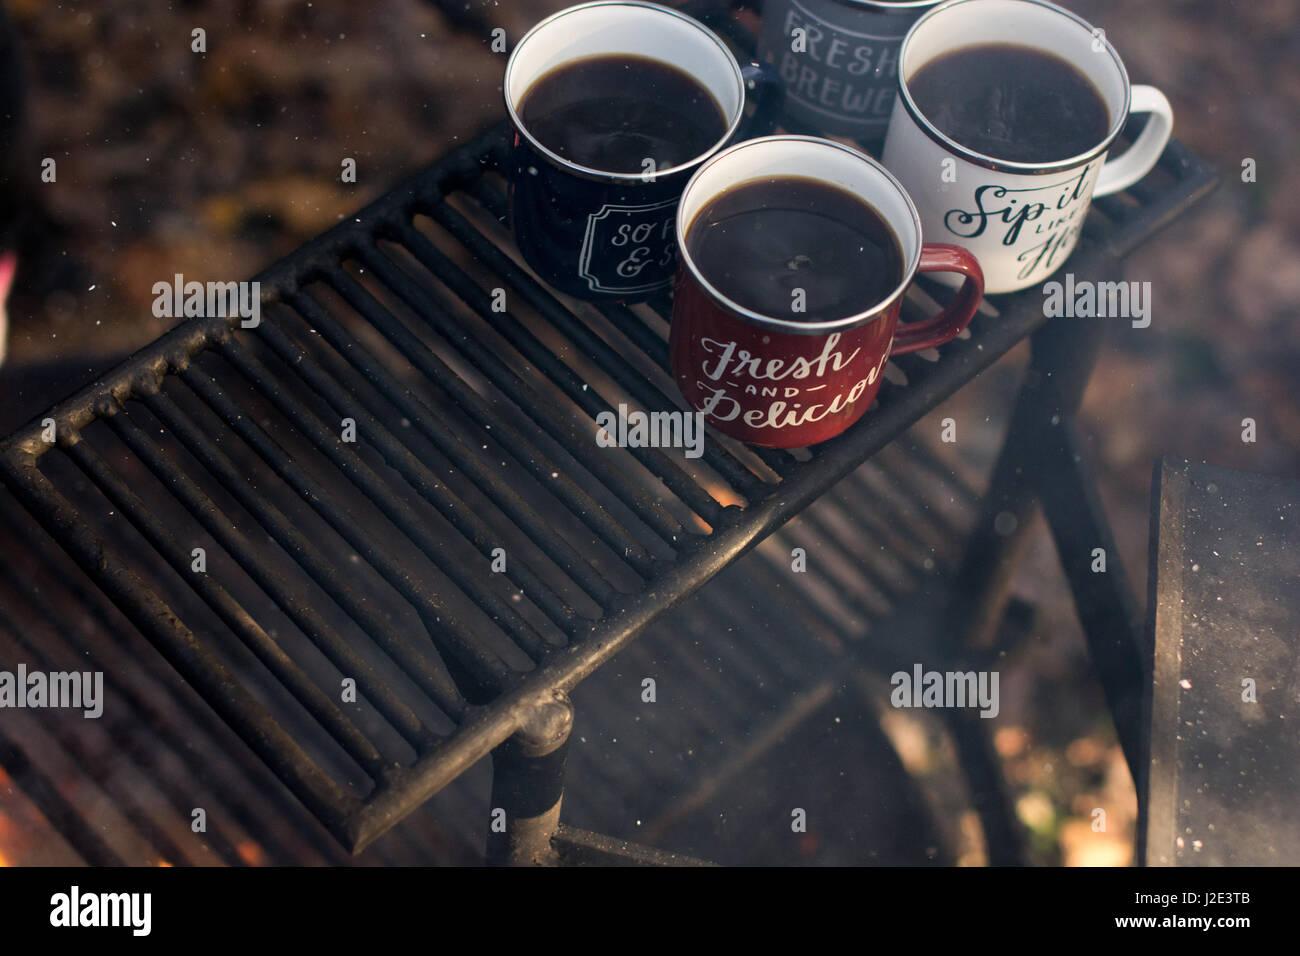 nice coffee - Stock Image